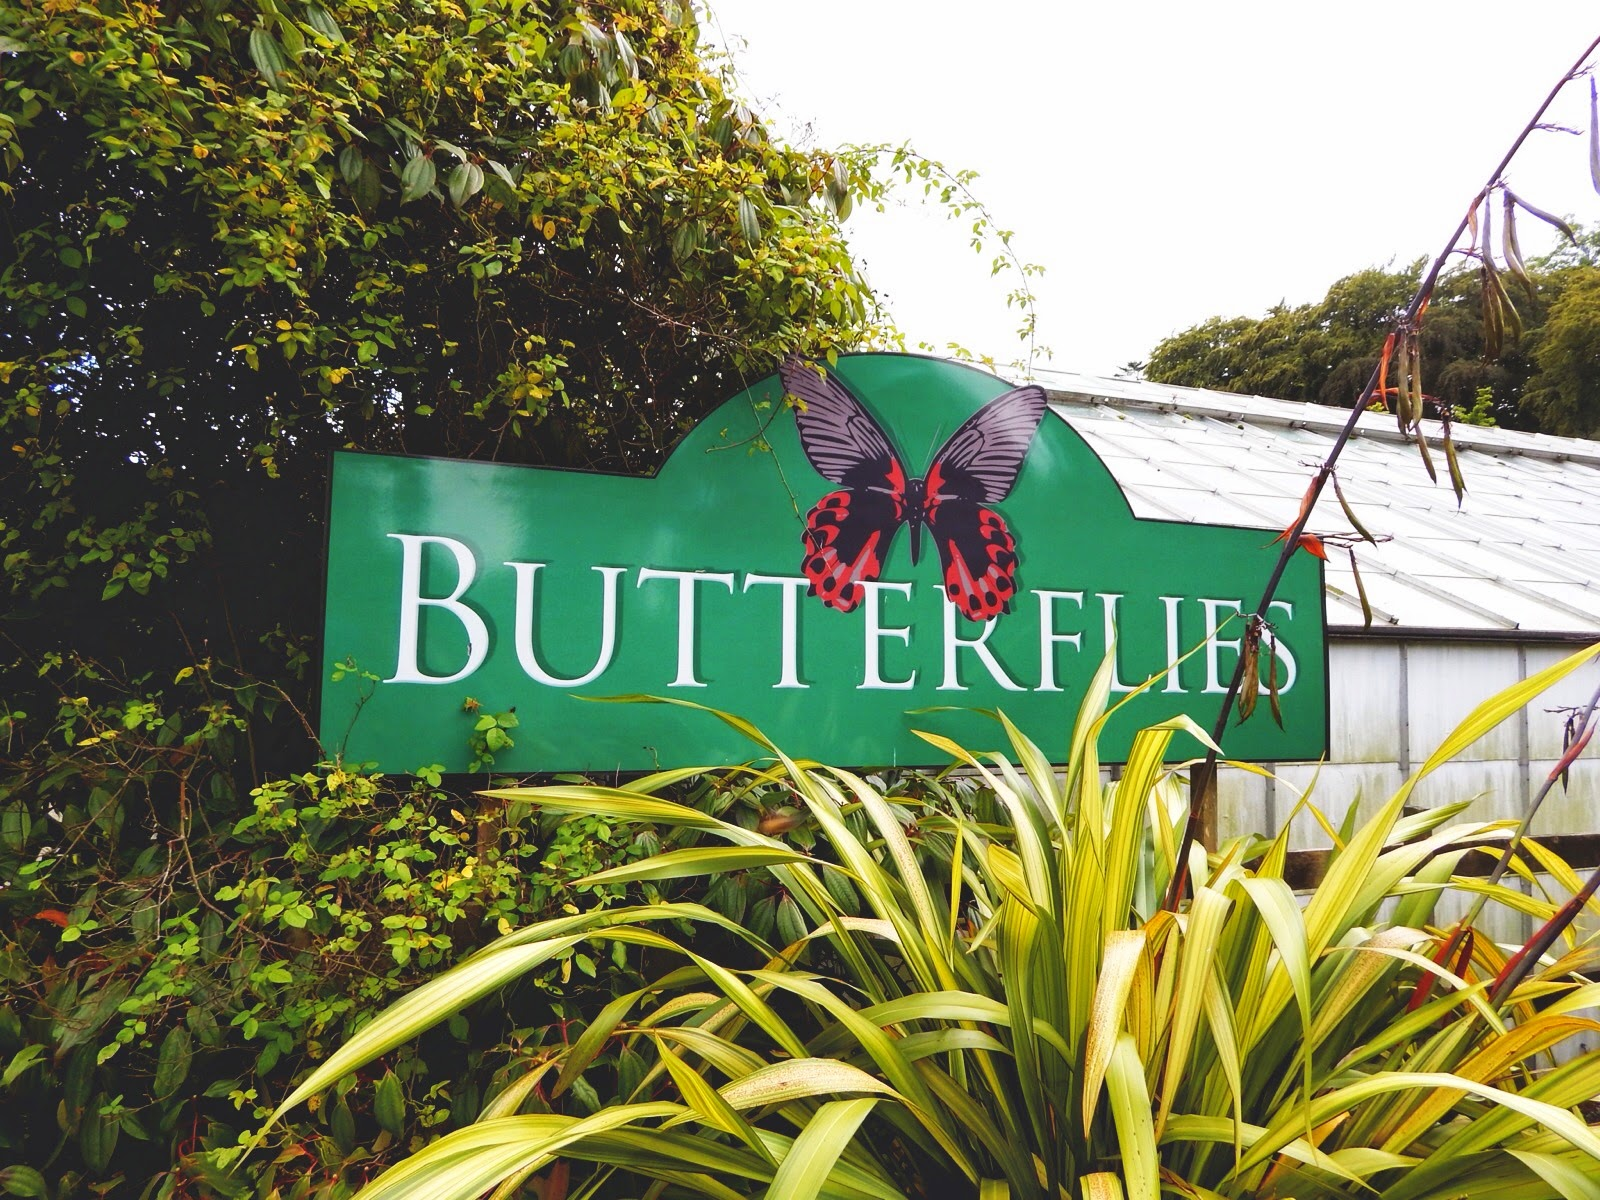 Best Kitchen Gallery: Seaforde Tropical Butterfly House Alphabeth of Tropical Butterfly House  on rachelxblog.com